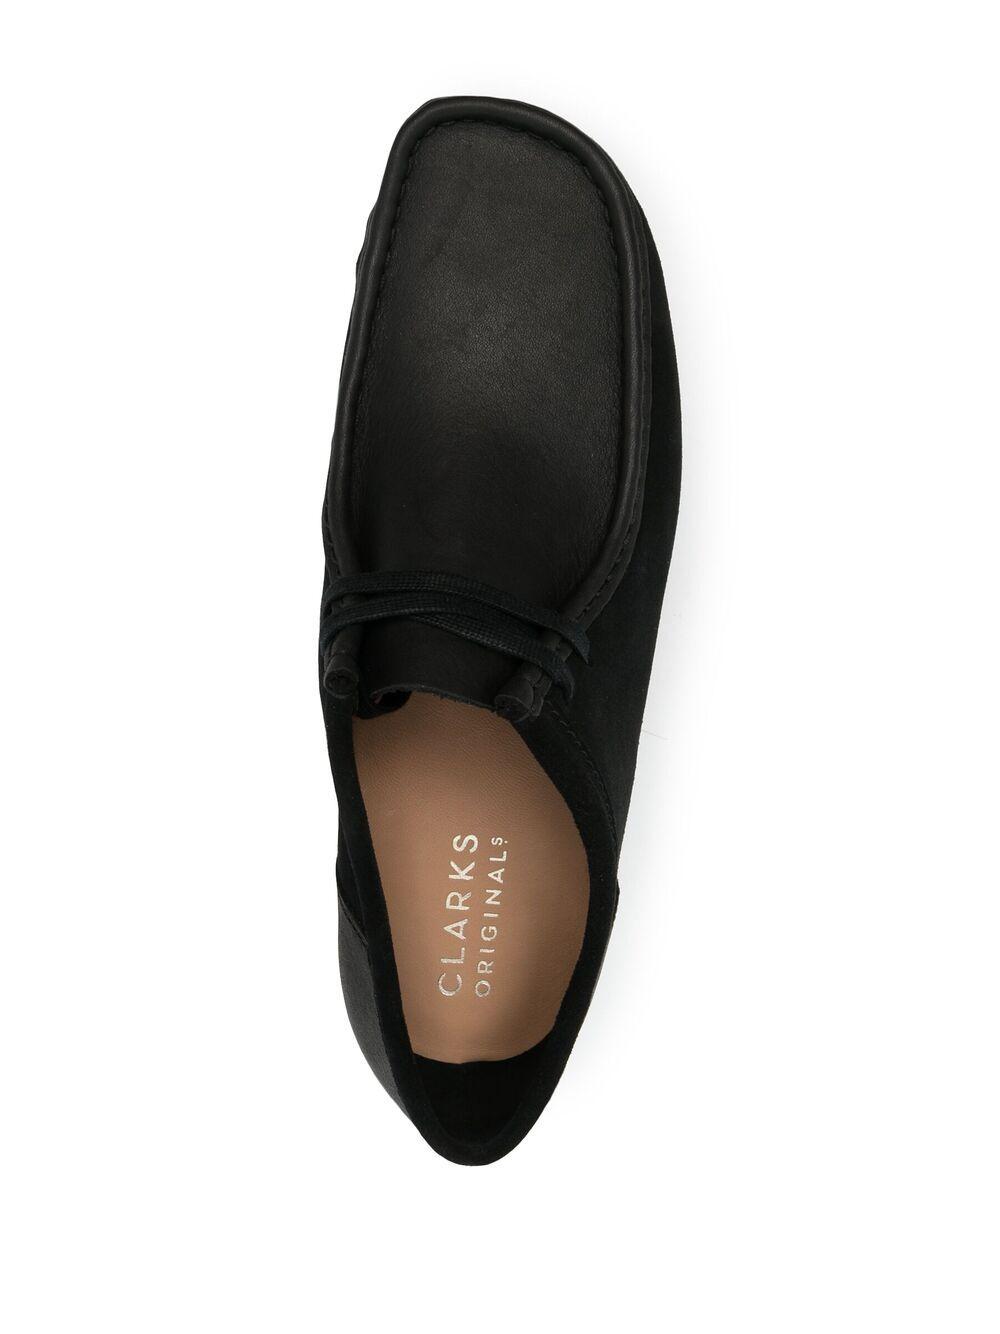 Clarks Original wallabee 2clr man CLARKS | Laced Shoes | 160489BLACK